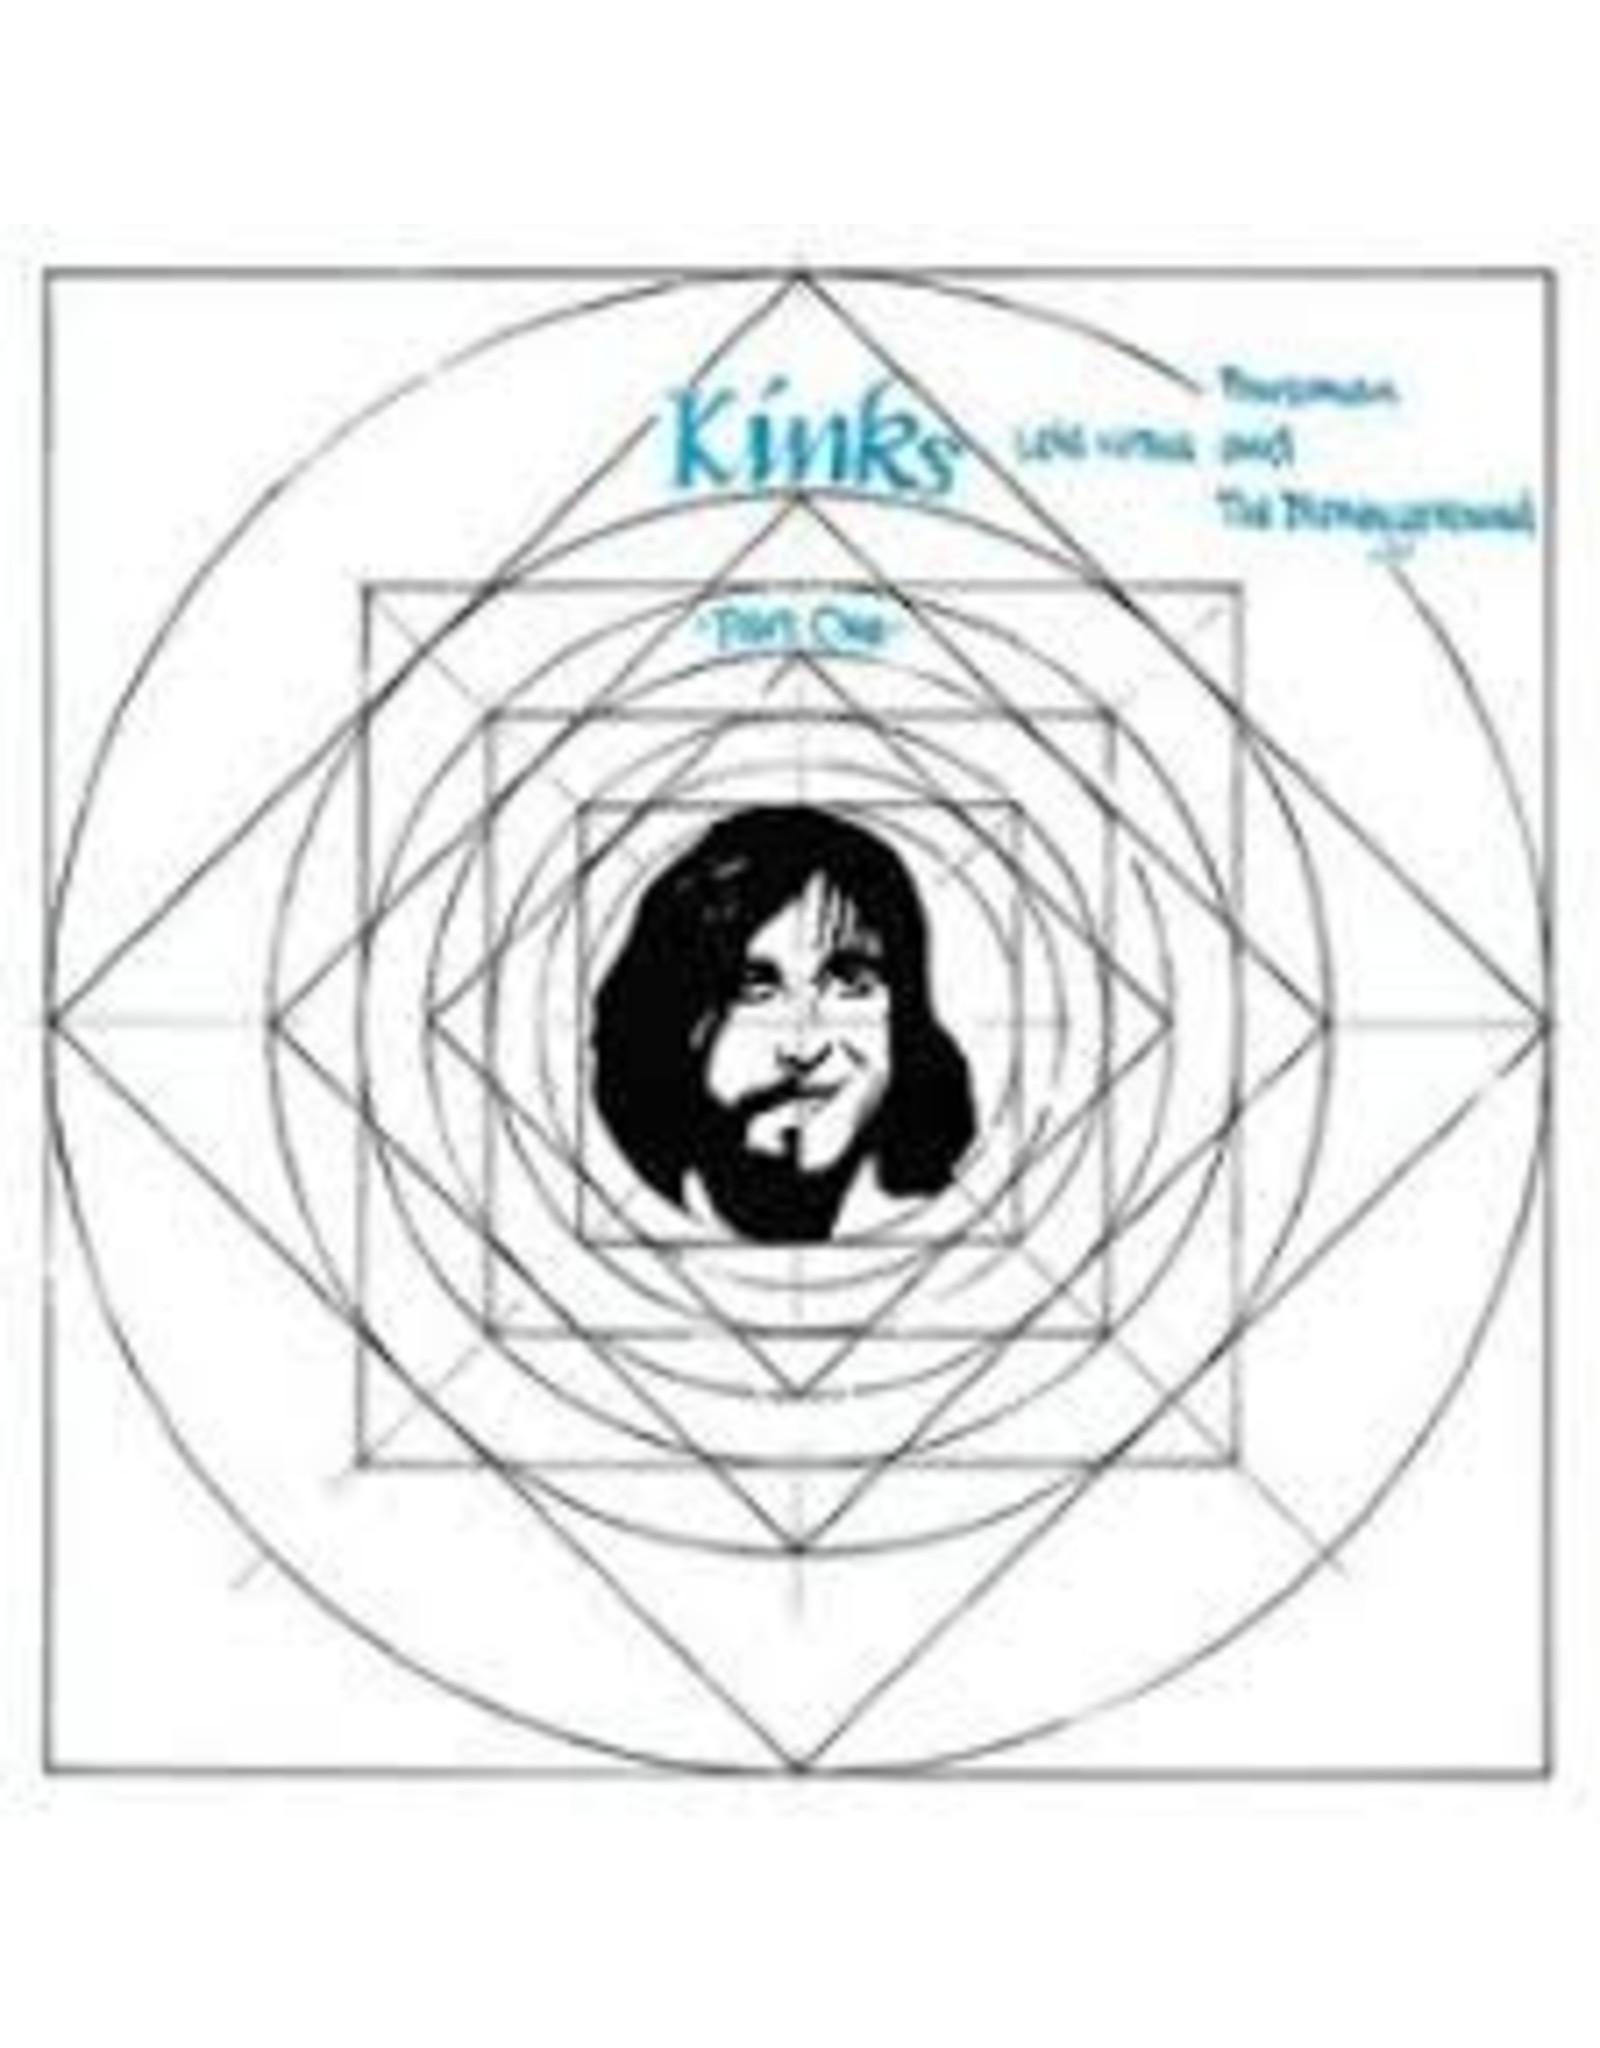 Kinks - Lola Vs Powerman